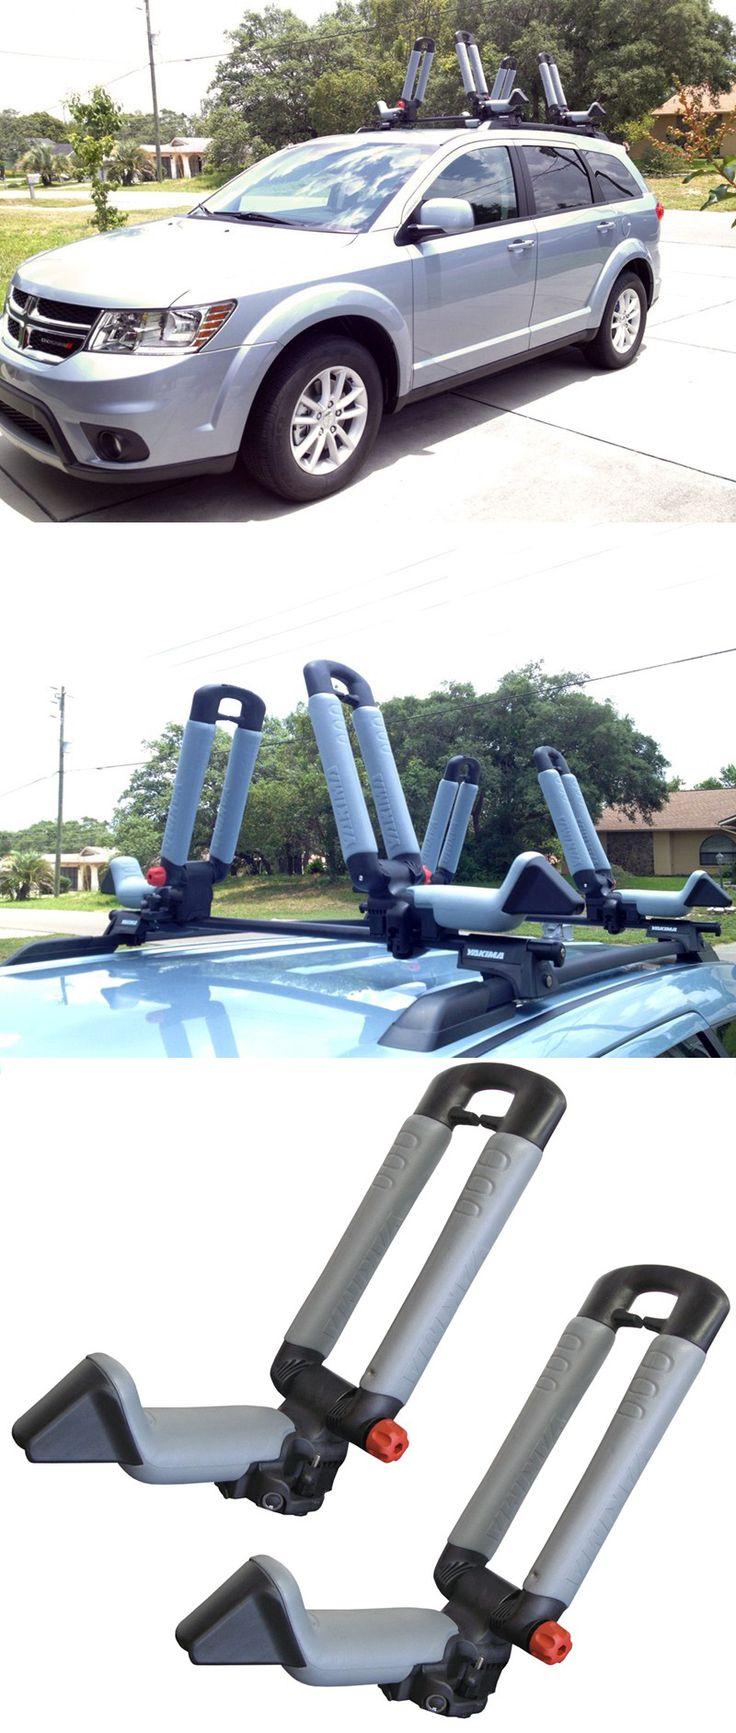 Kayak On Roof >> Yakima BowDown Folding J-Style Kayak Carrier for Roof Racks